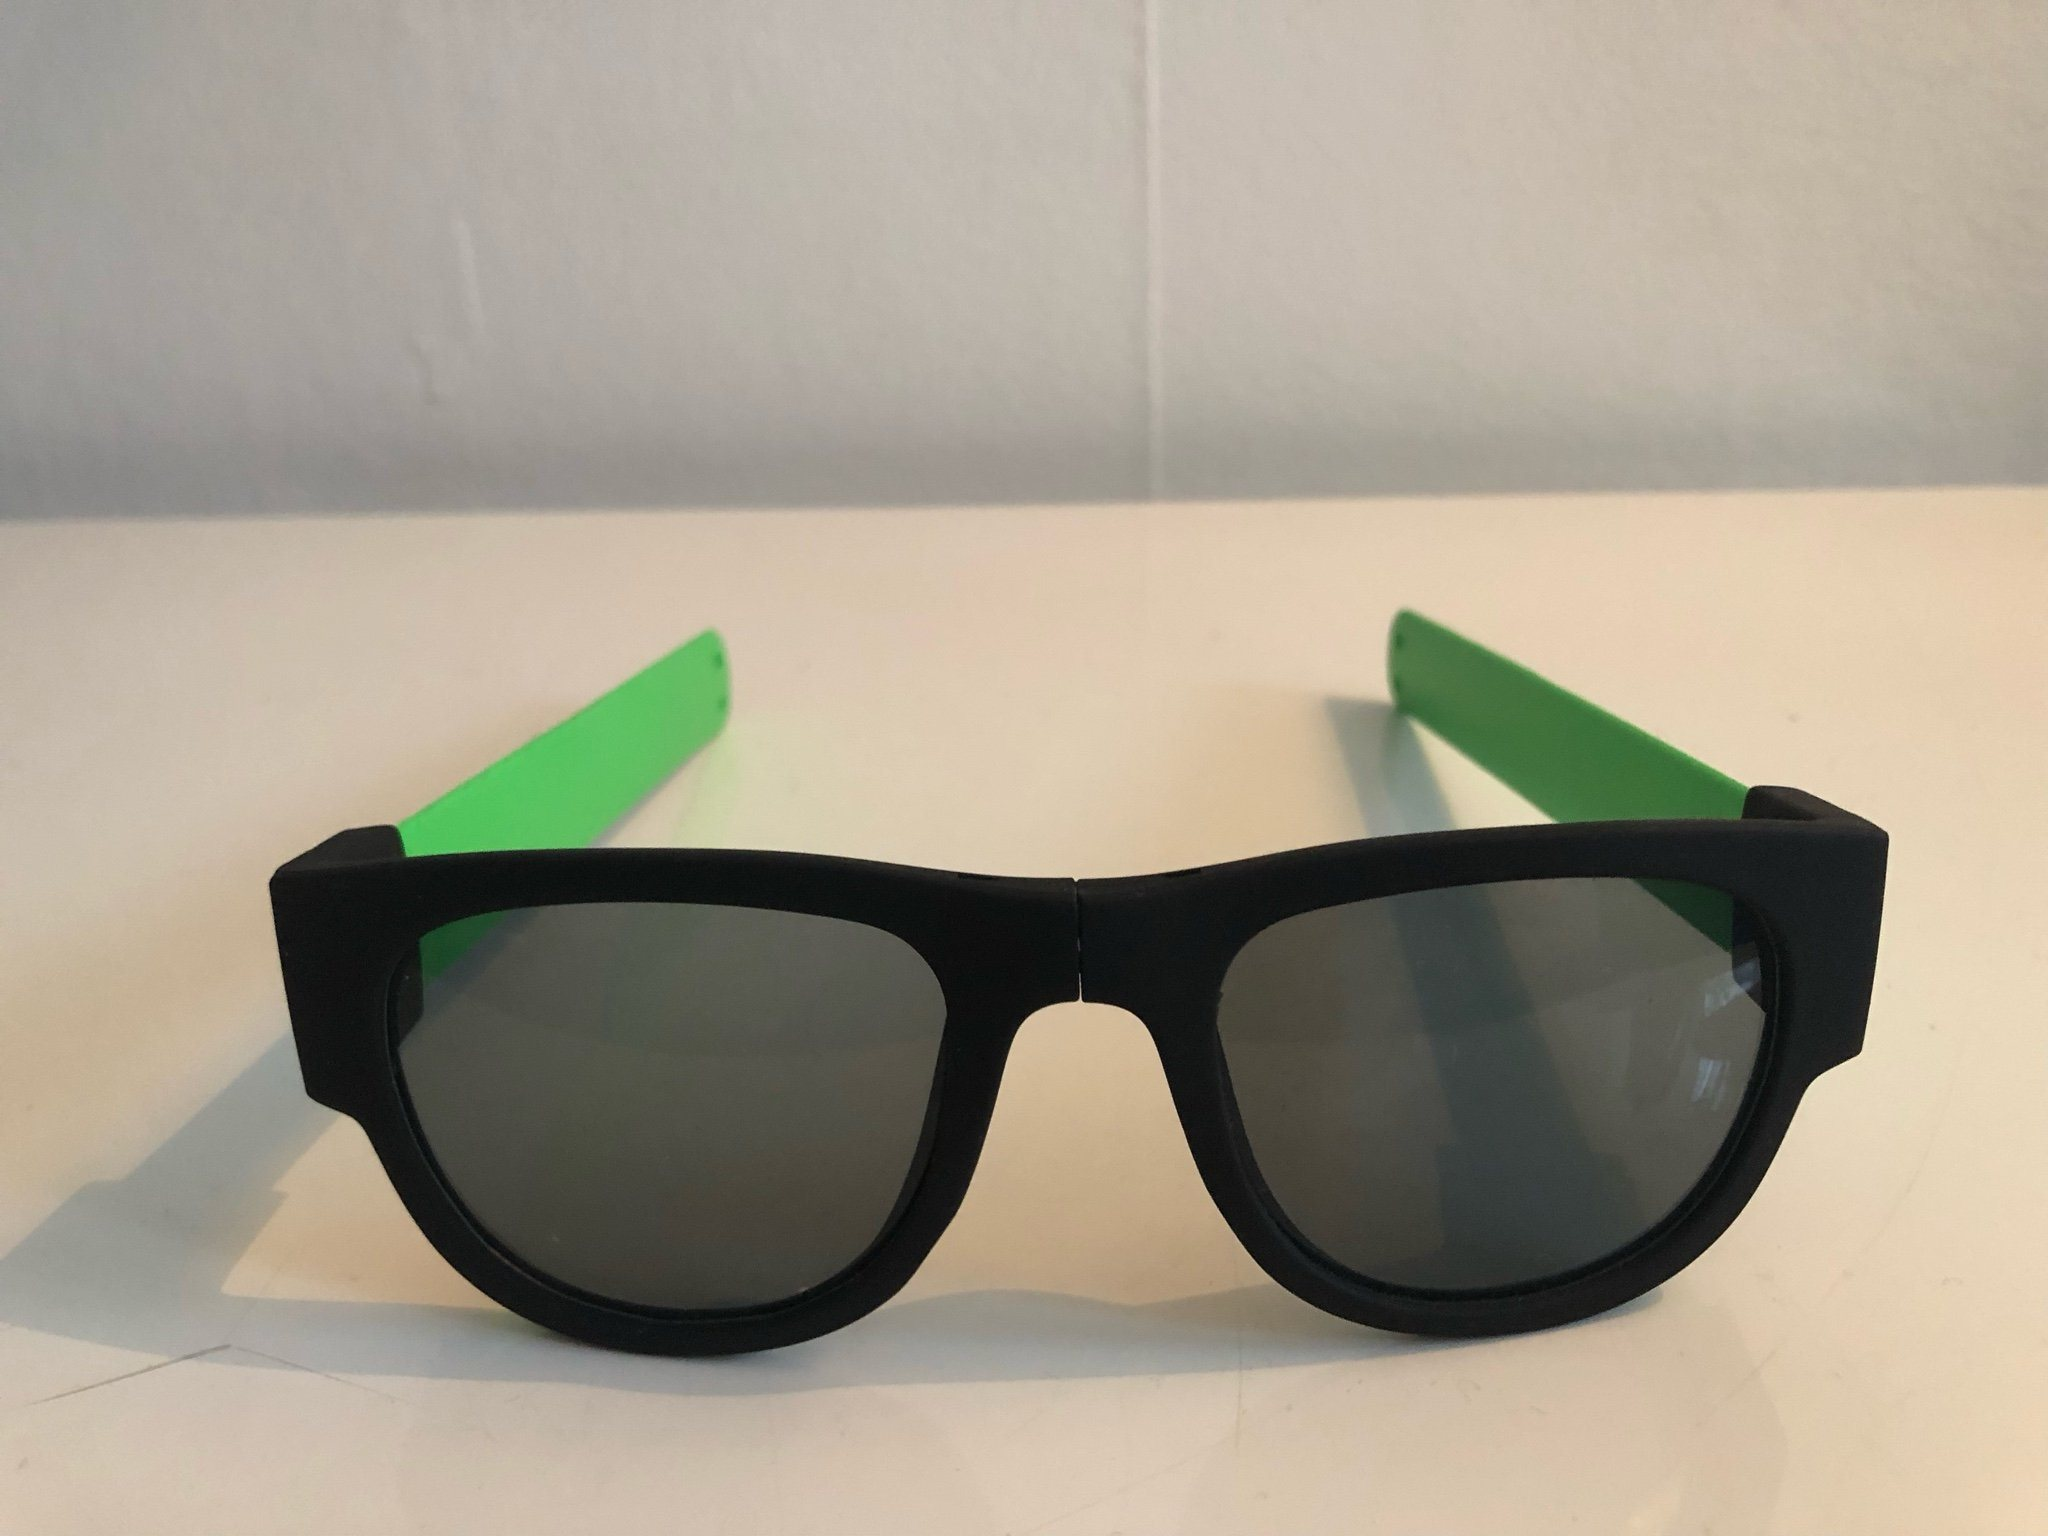 Solglasögon glasögon vikbara foldable snapper g.. (341923861) ᐈ Köp ... 4eefa0cd2e5d7